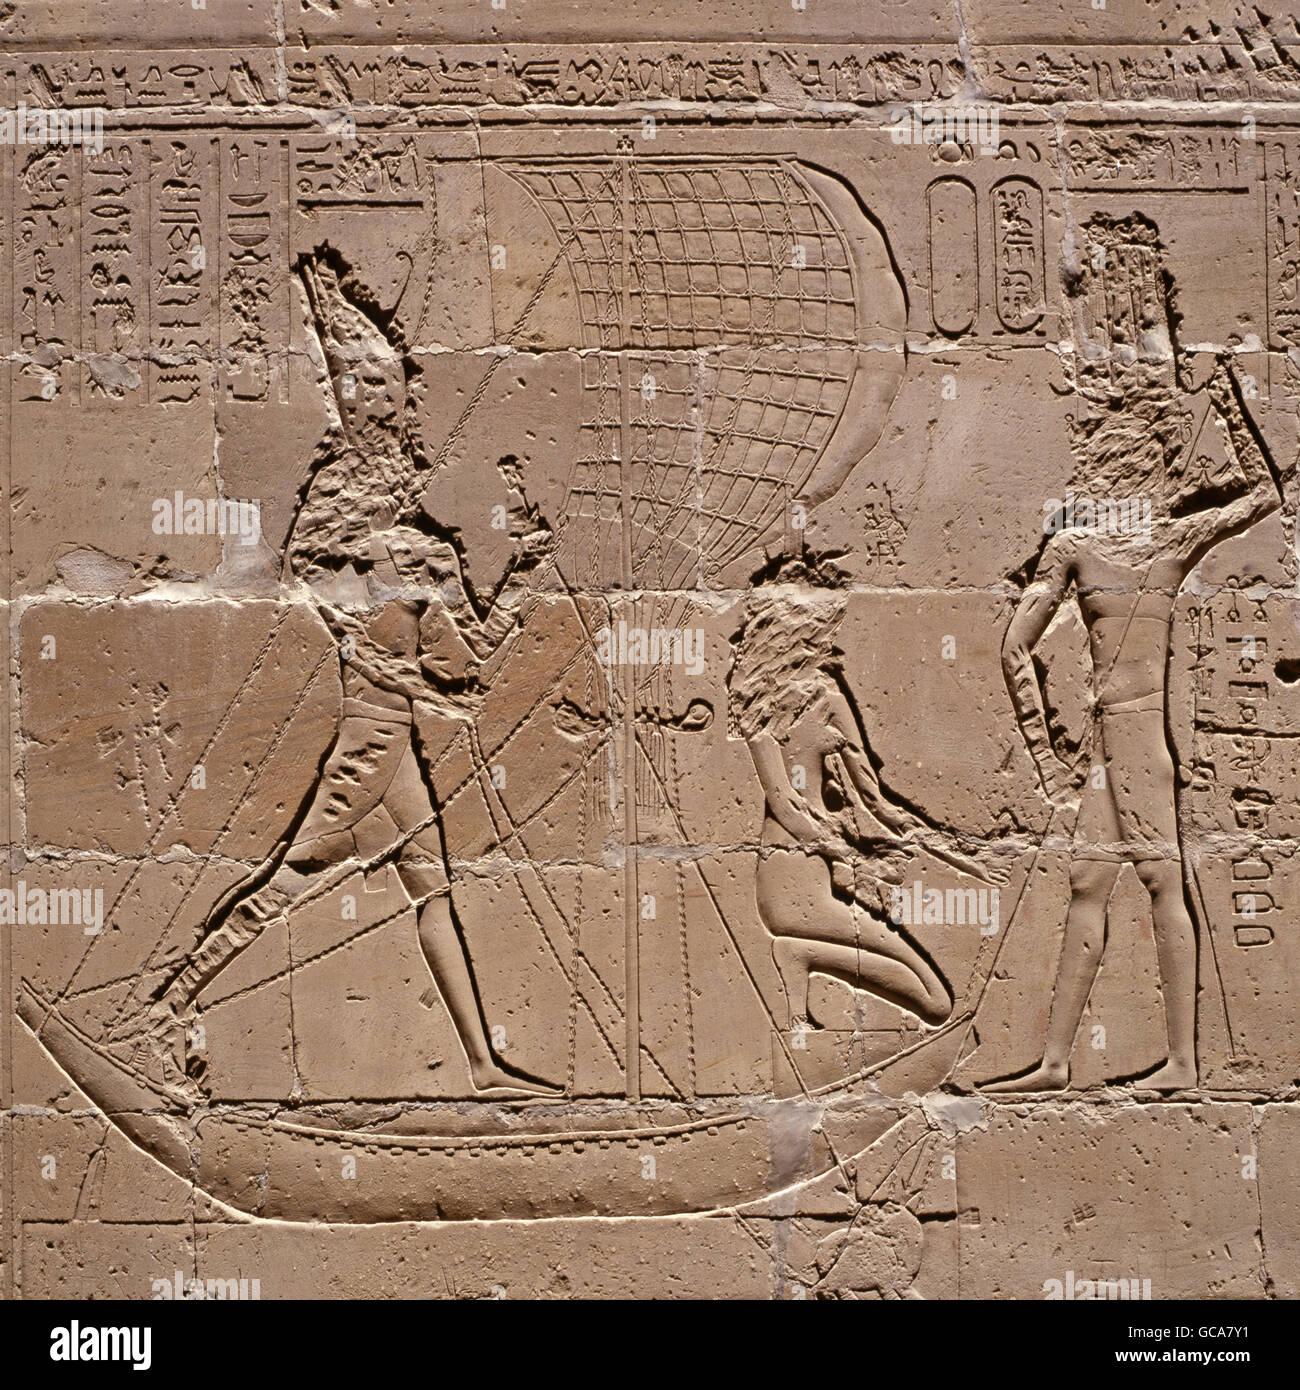 Bildende Kunst, antike, Ägypten, Horus Tempel, Pharao im Boot, während Nilpferd Jagd, Edfu, Stockbild